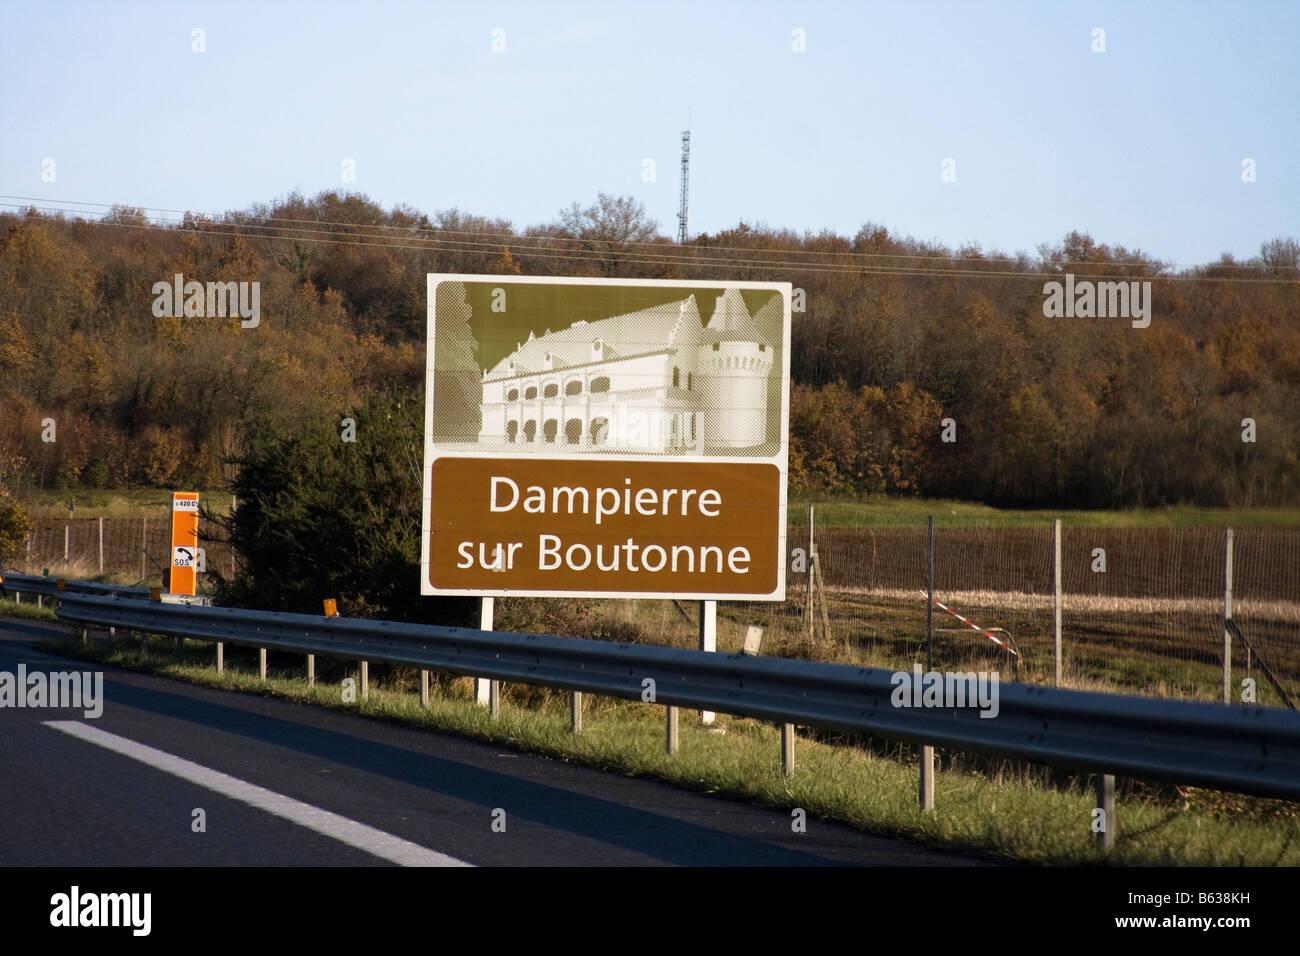 French Autoroute tourist signs - Dampierre sur Boutonne Stock Photo